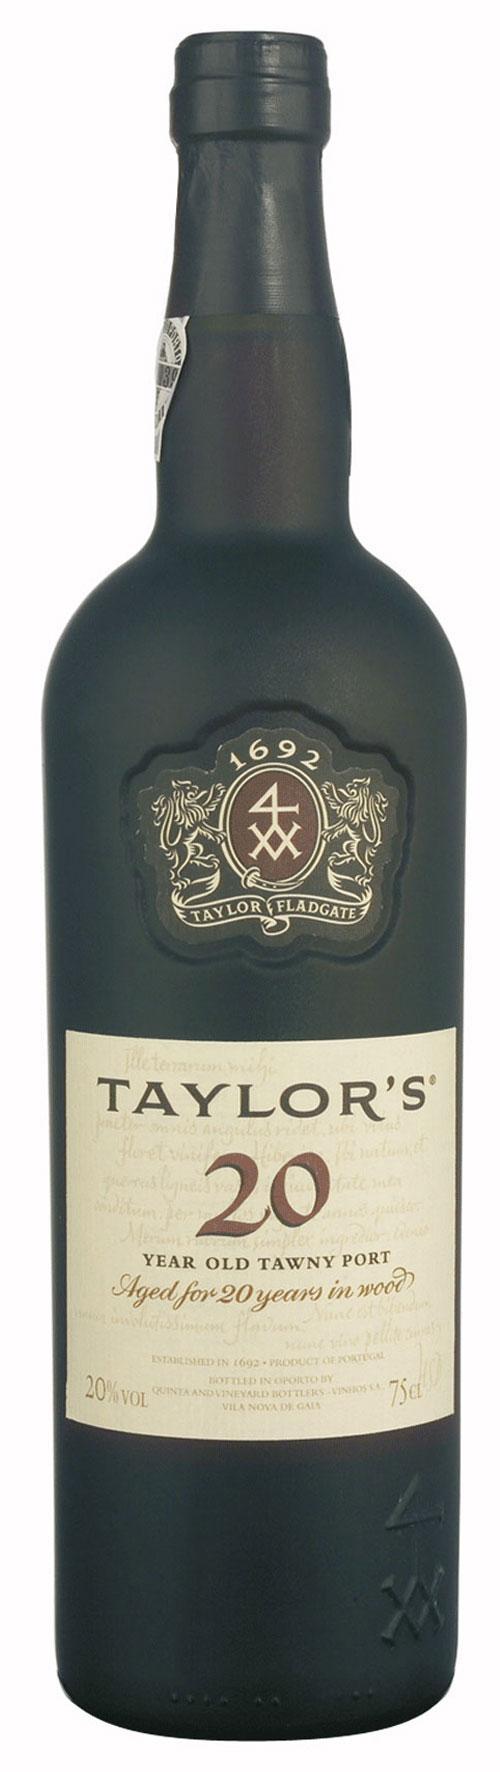 Portwein Taylor's Tawny 20 Years Port